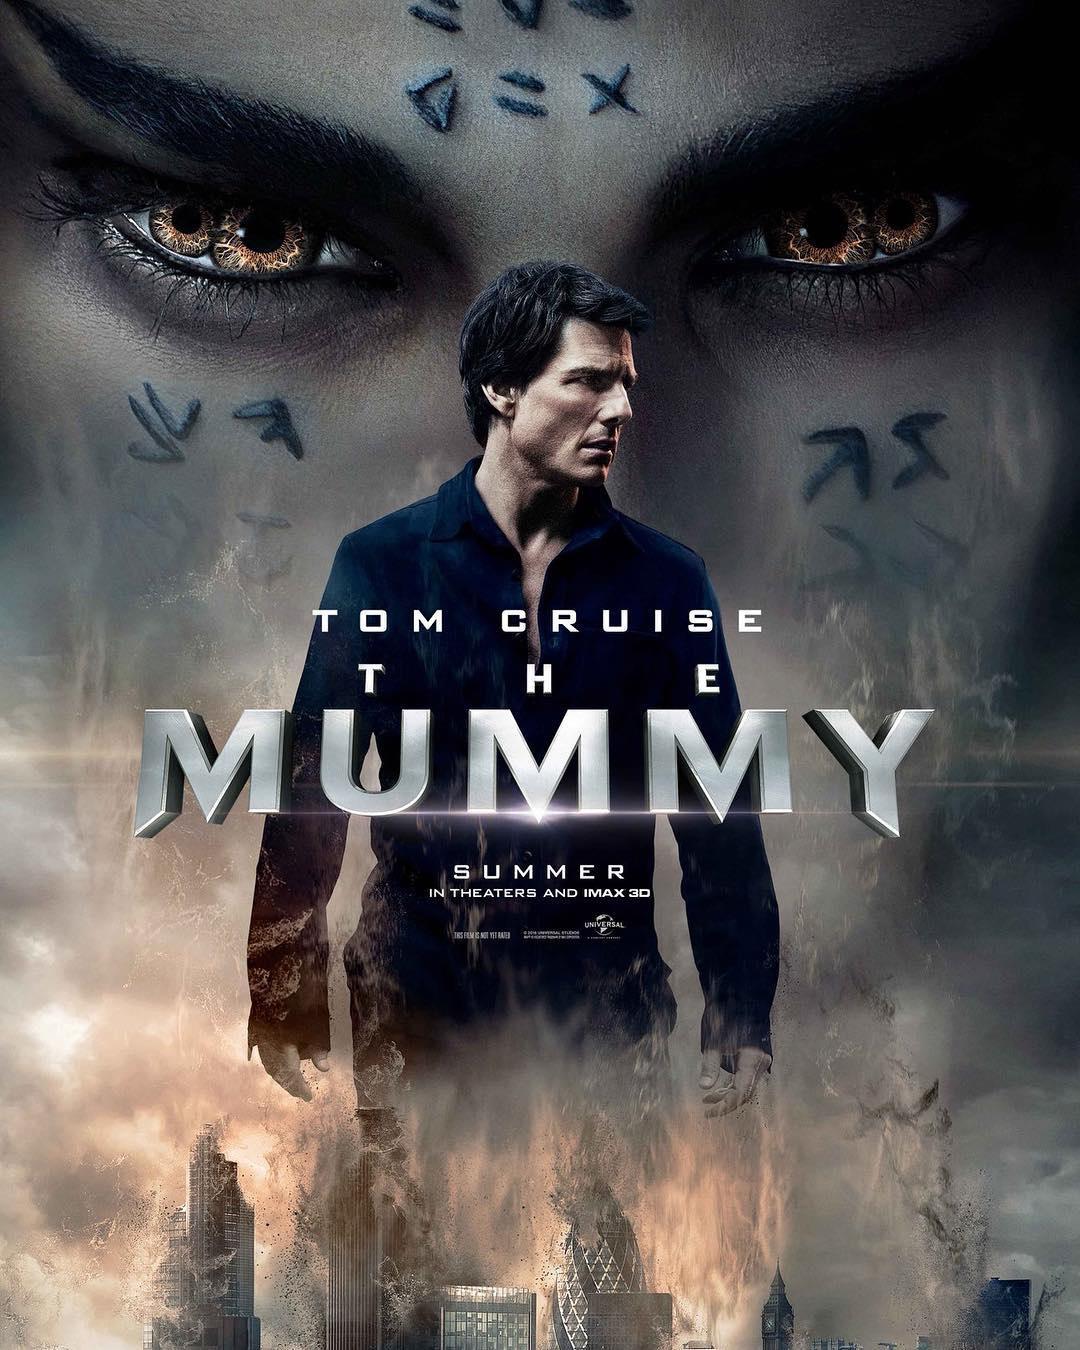 The Mummy (2019) - director - alex kurtzmanconcept department - MPCArt director Ravi Bansal